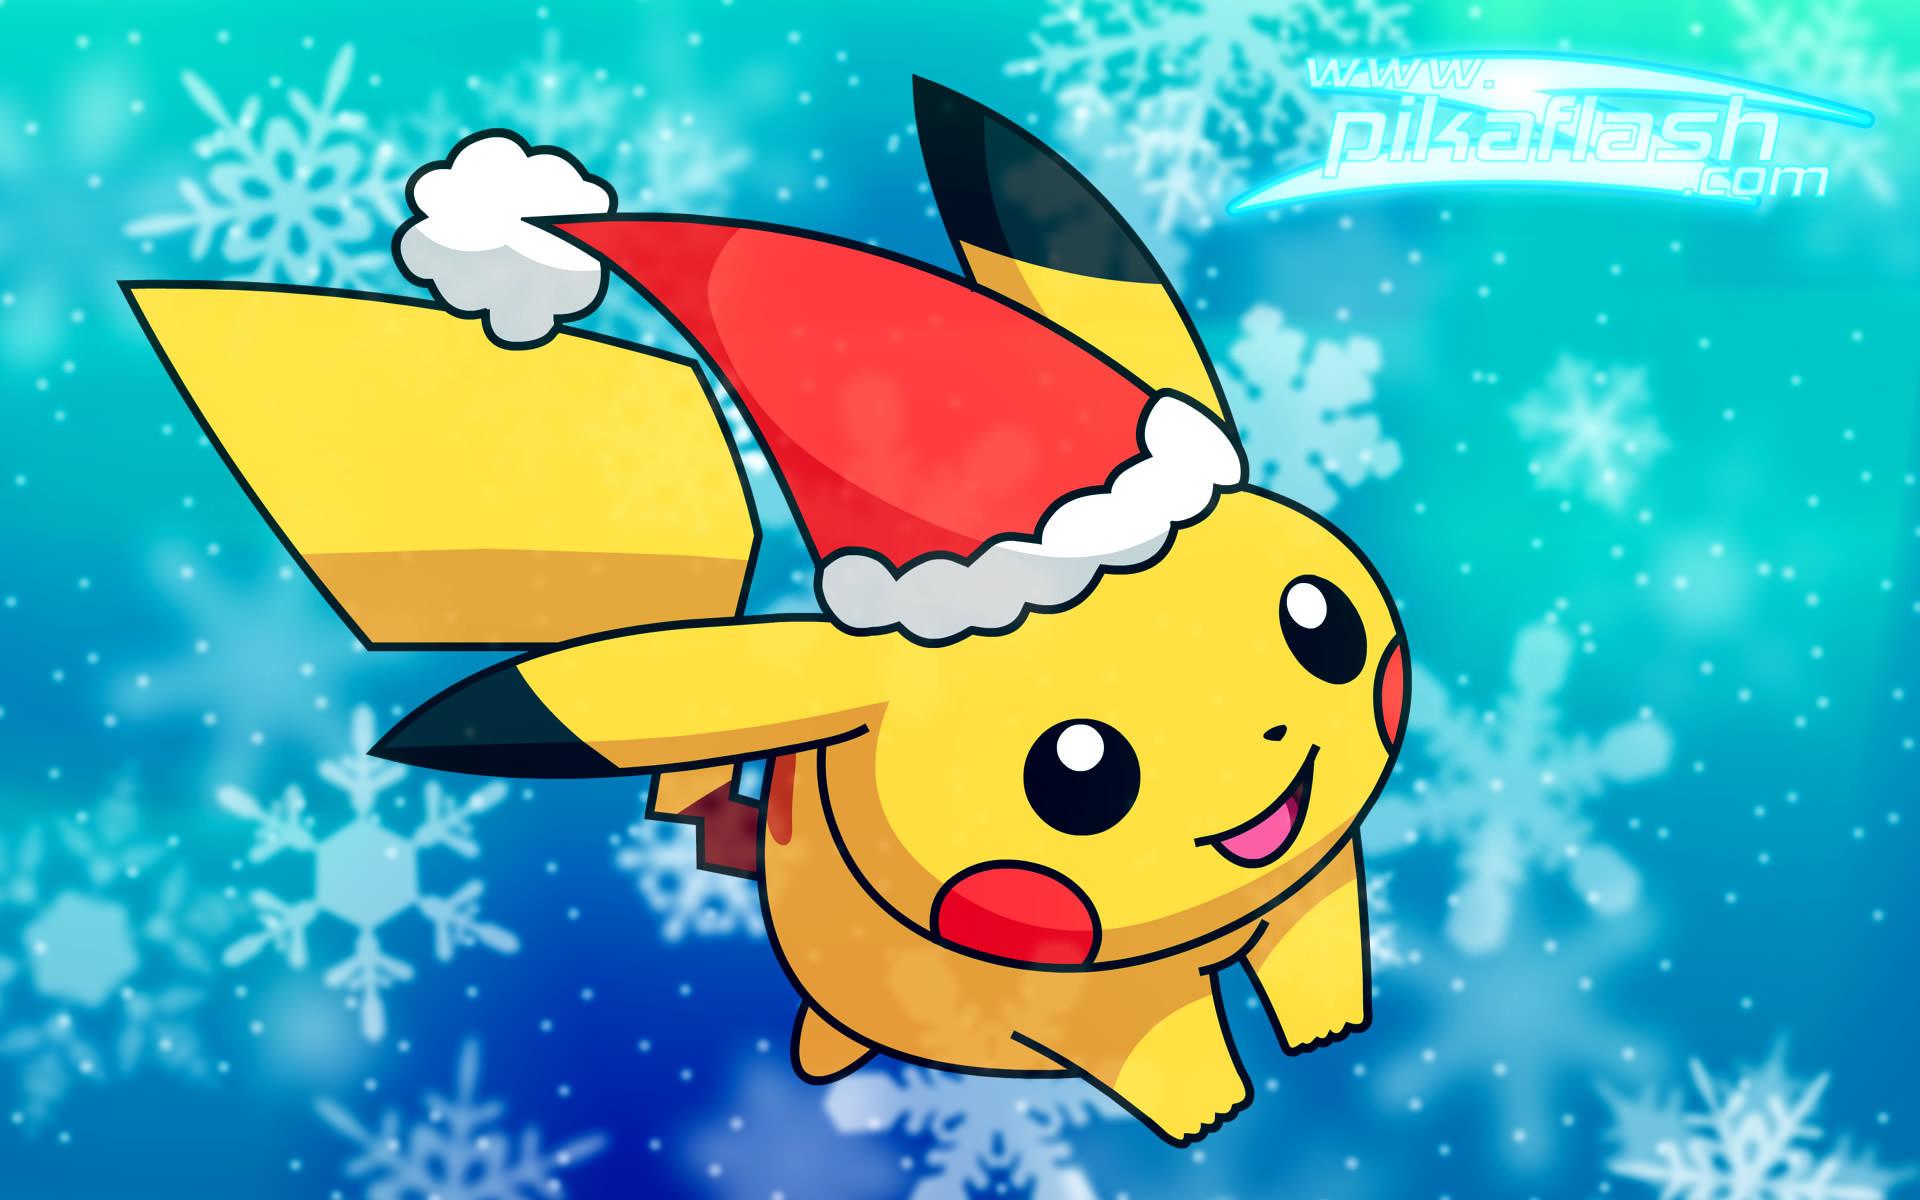 Cute Pikachu Wallpaper